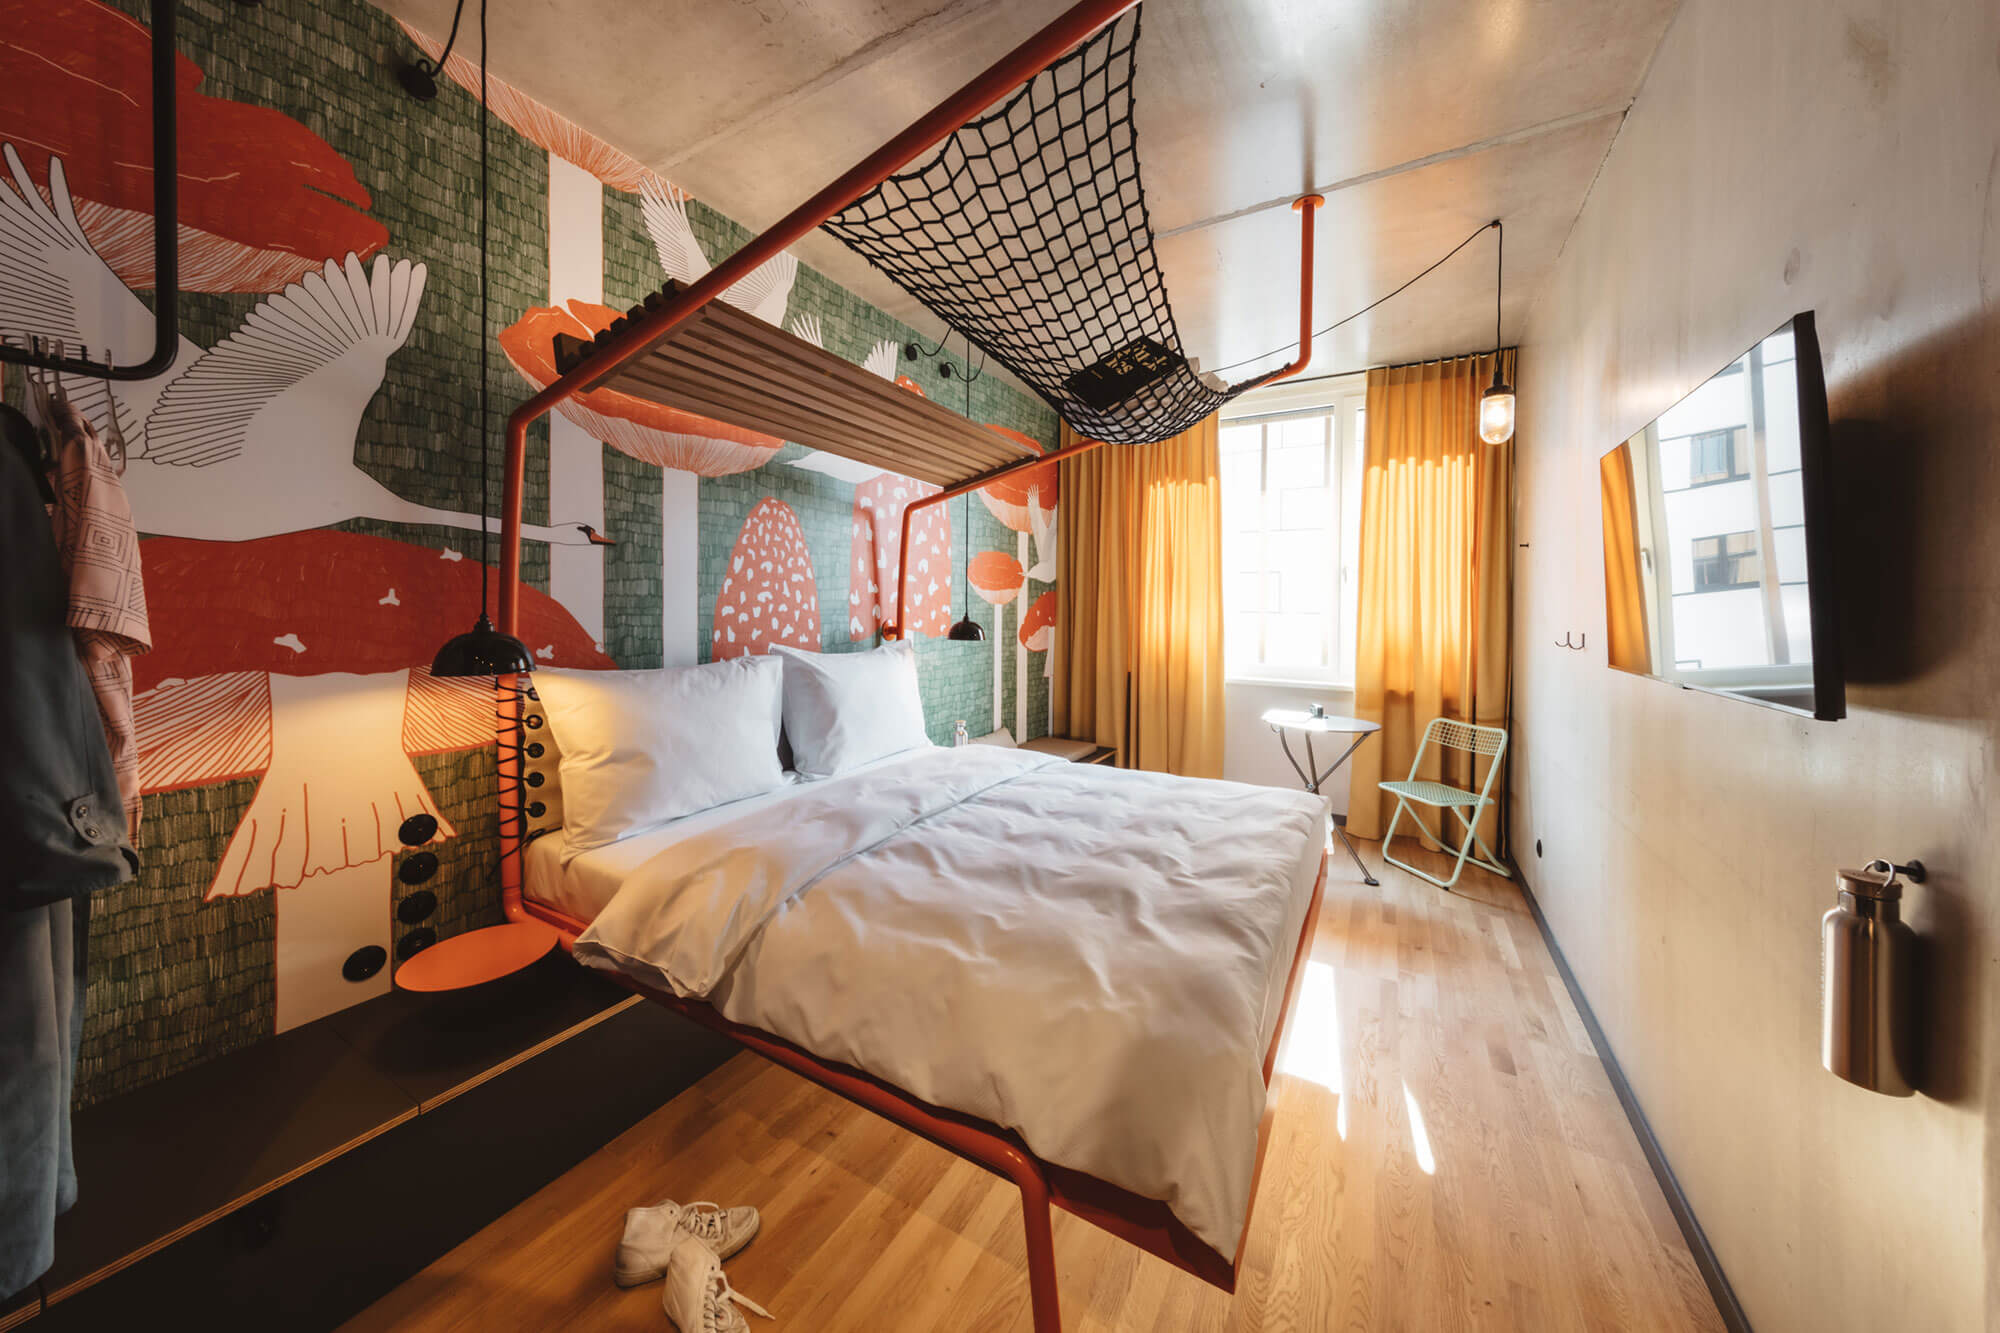 Superbude-Hotel-Hostel-Bachhuber-Hoteleinrichtungen-7